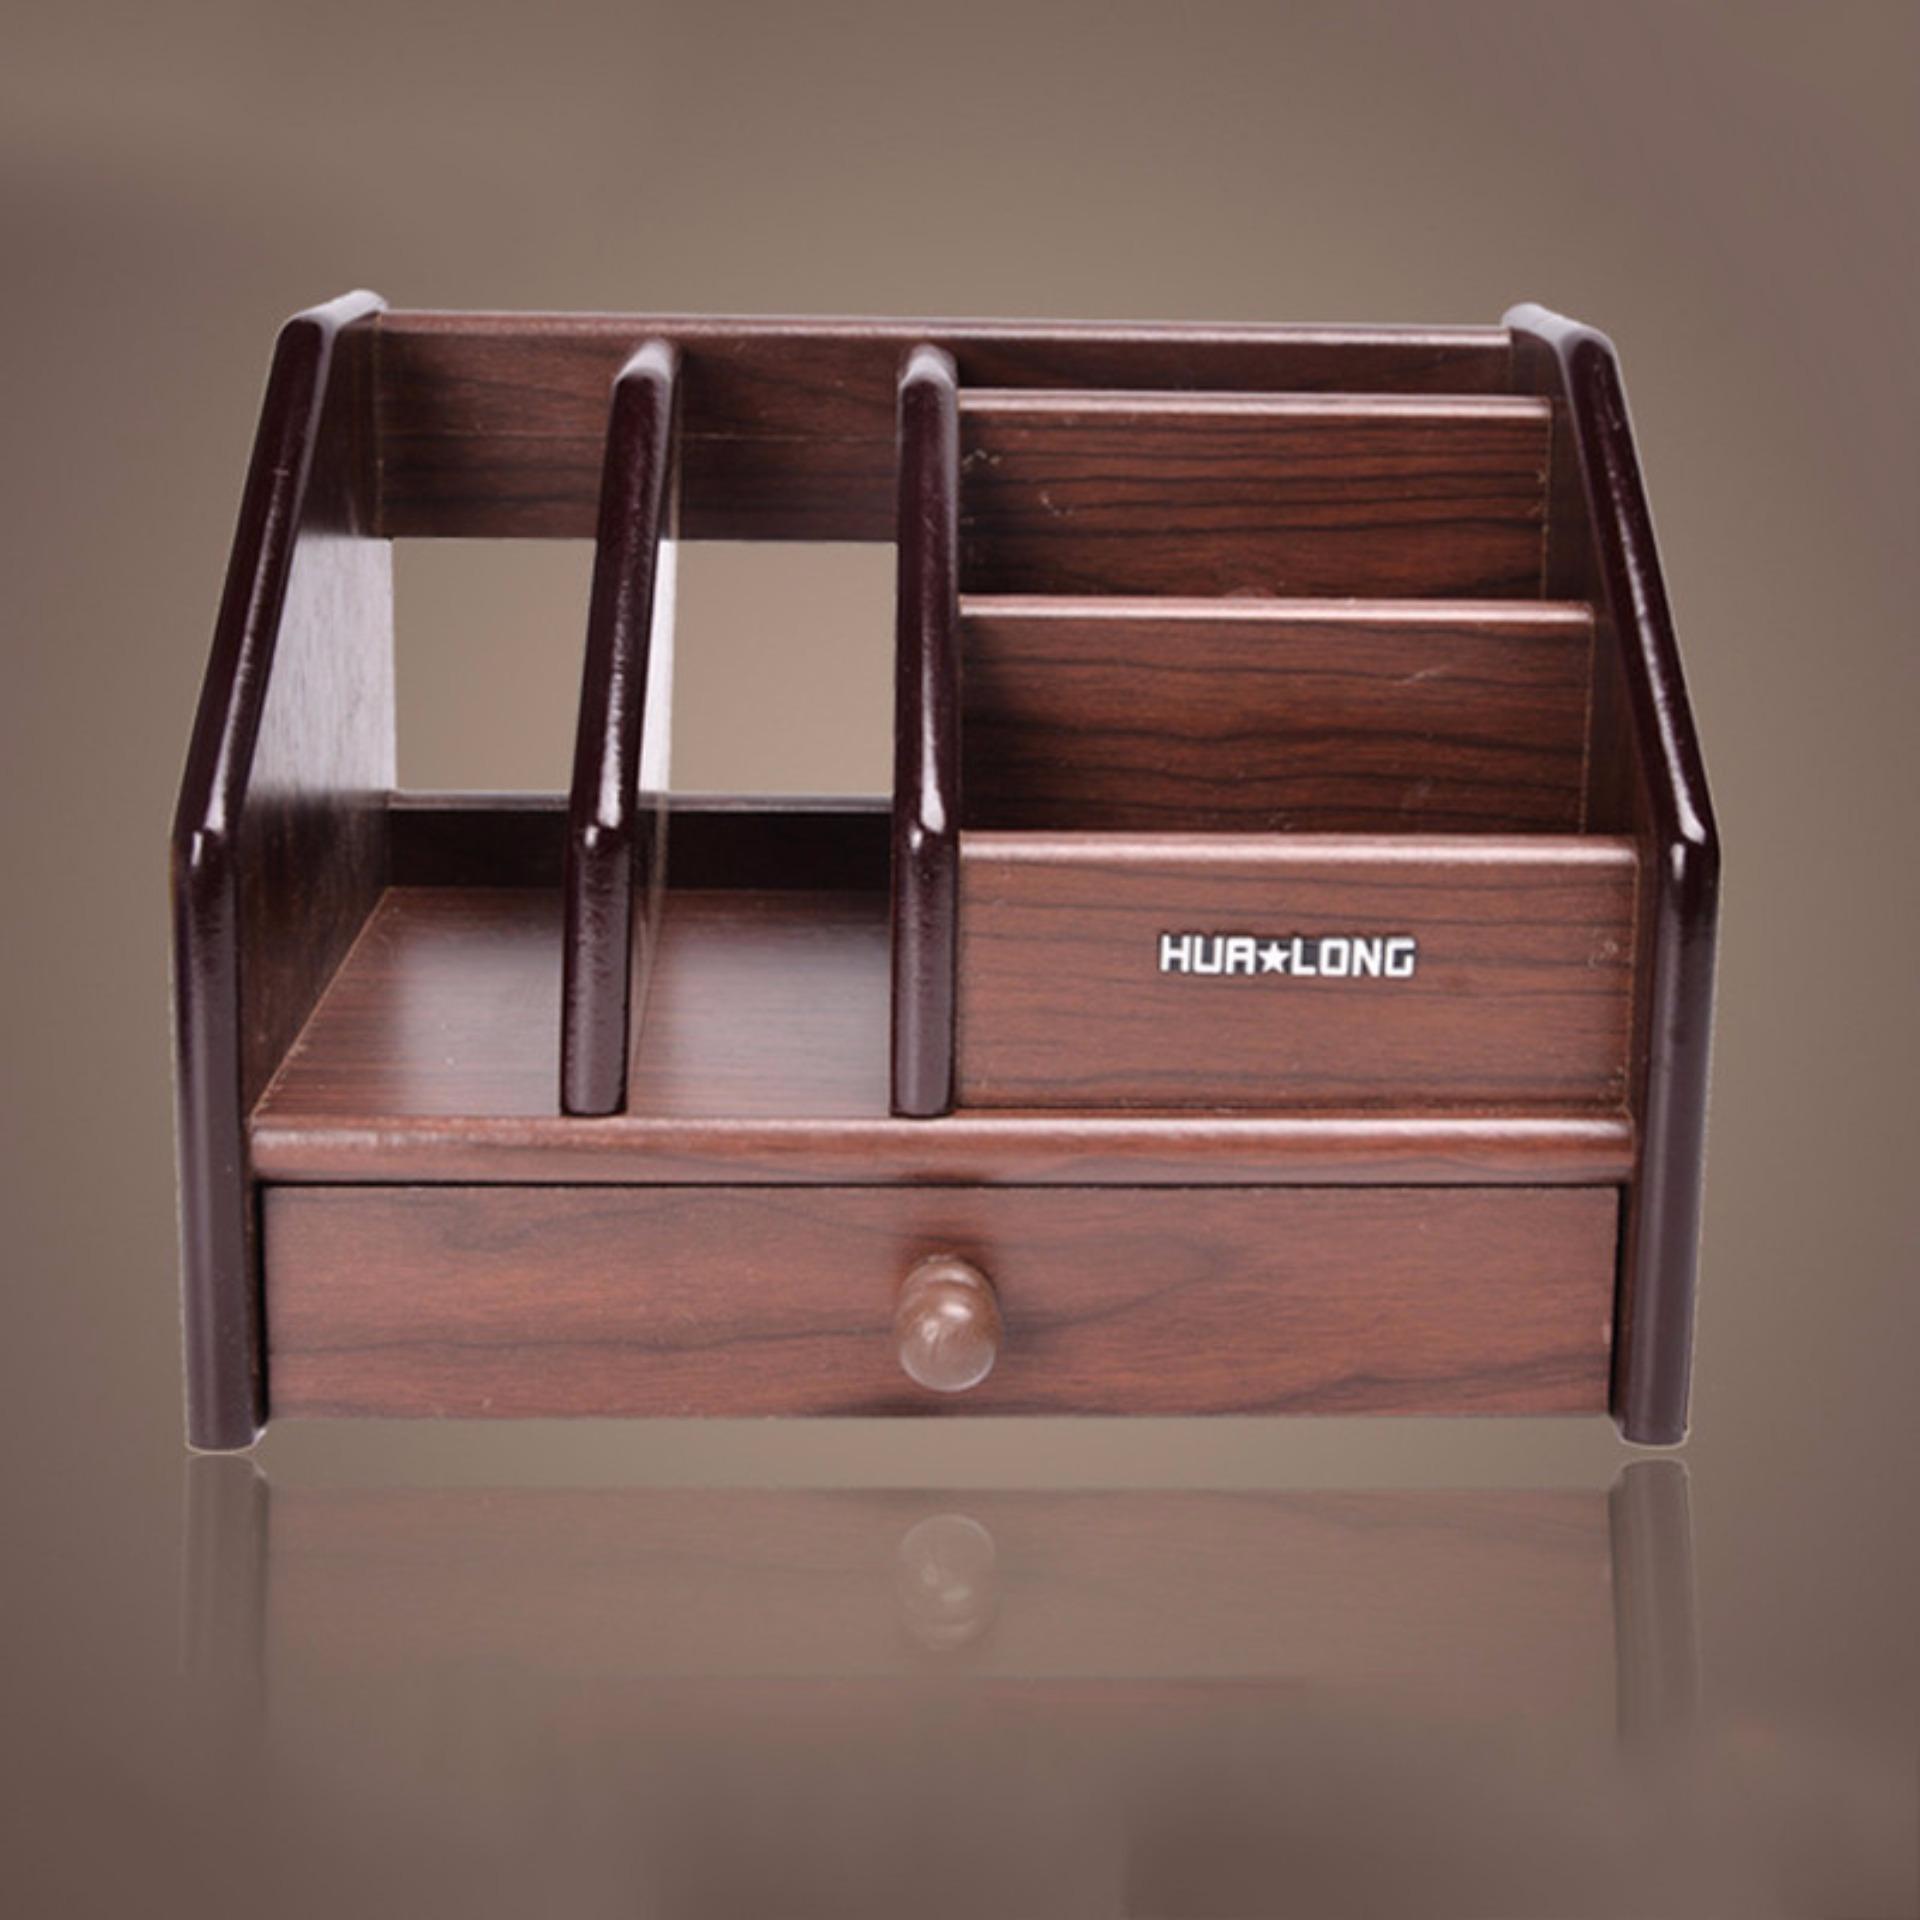 office desktop storage. Multifunctional Wooden Desktop Storage Boxes Case Office DeskStationery Organiser Holder Home Table Organizer Rack - Intl